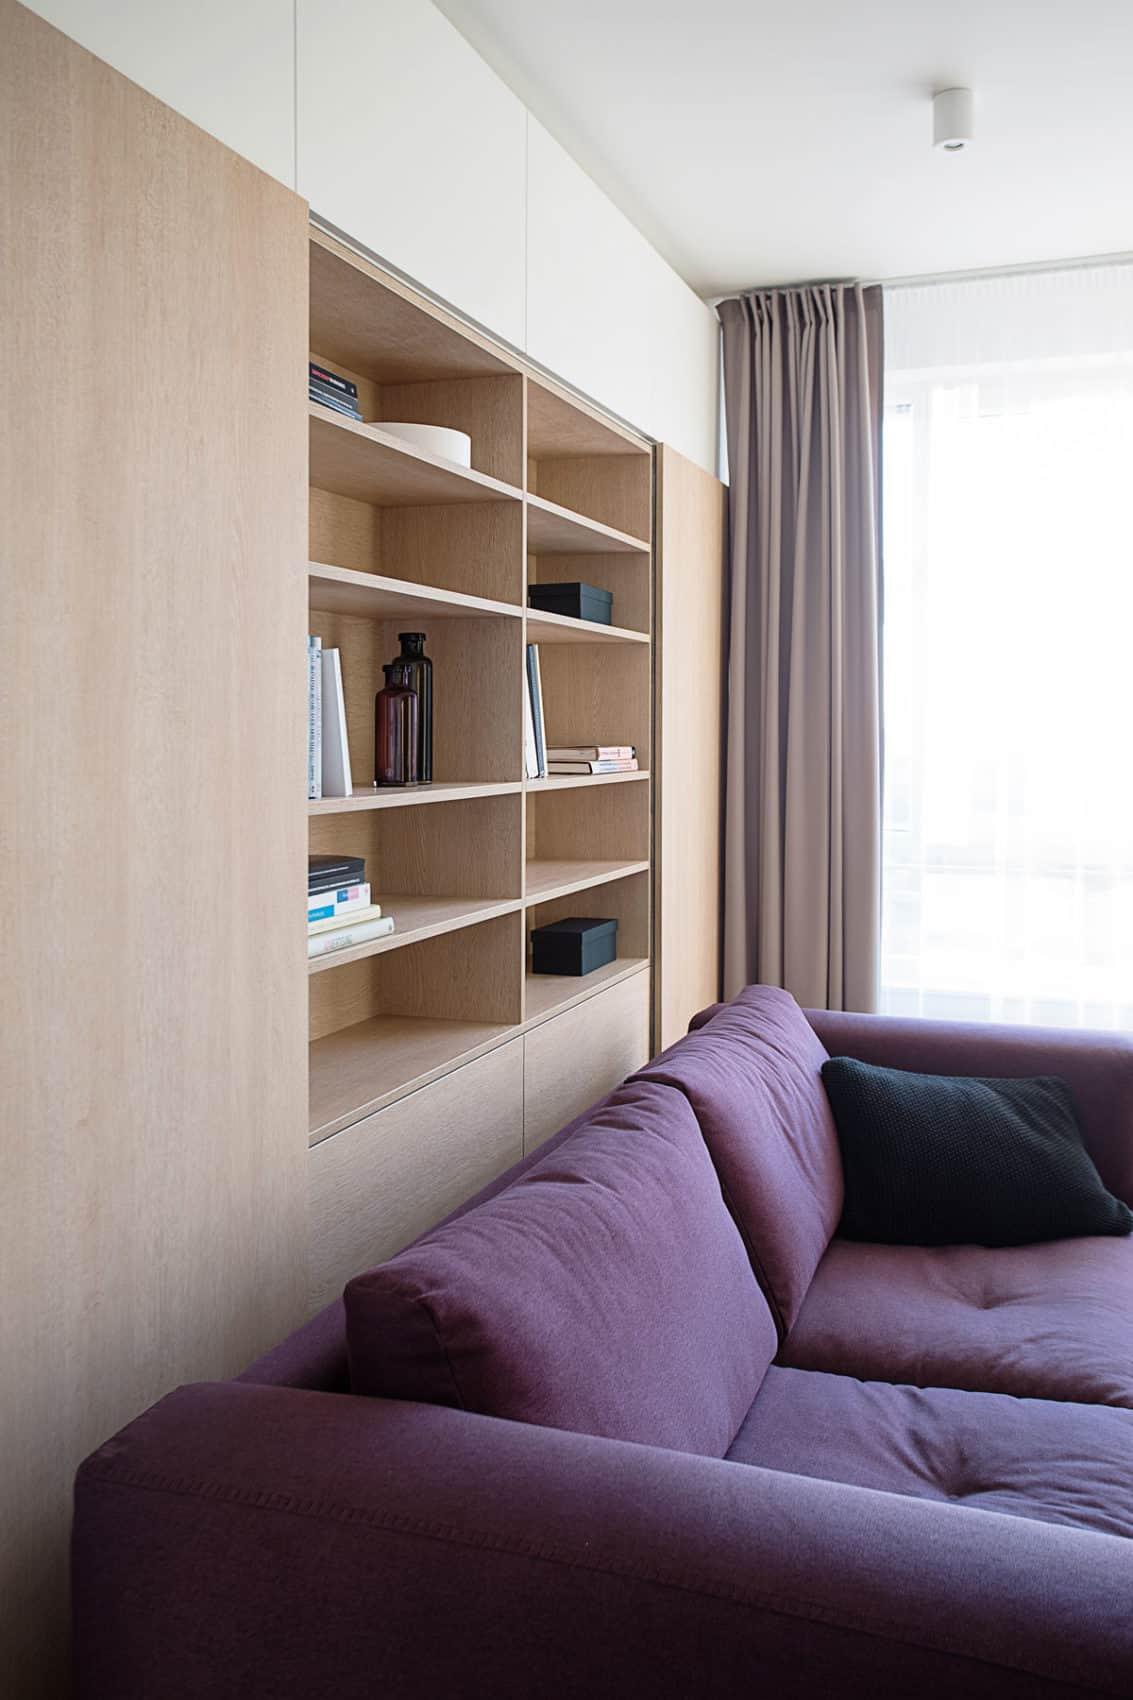 Apartment in Vilnius 2 by Normundas Vilkas (4)